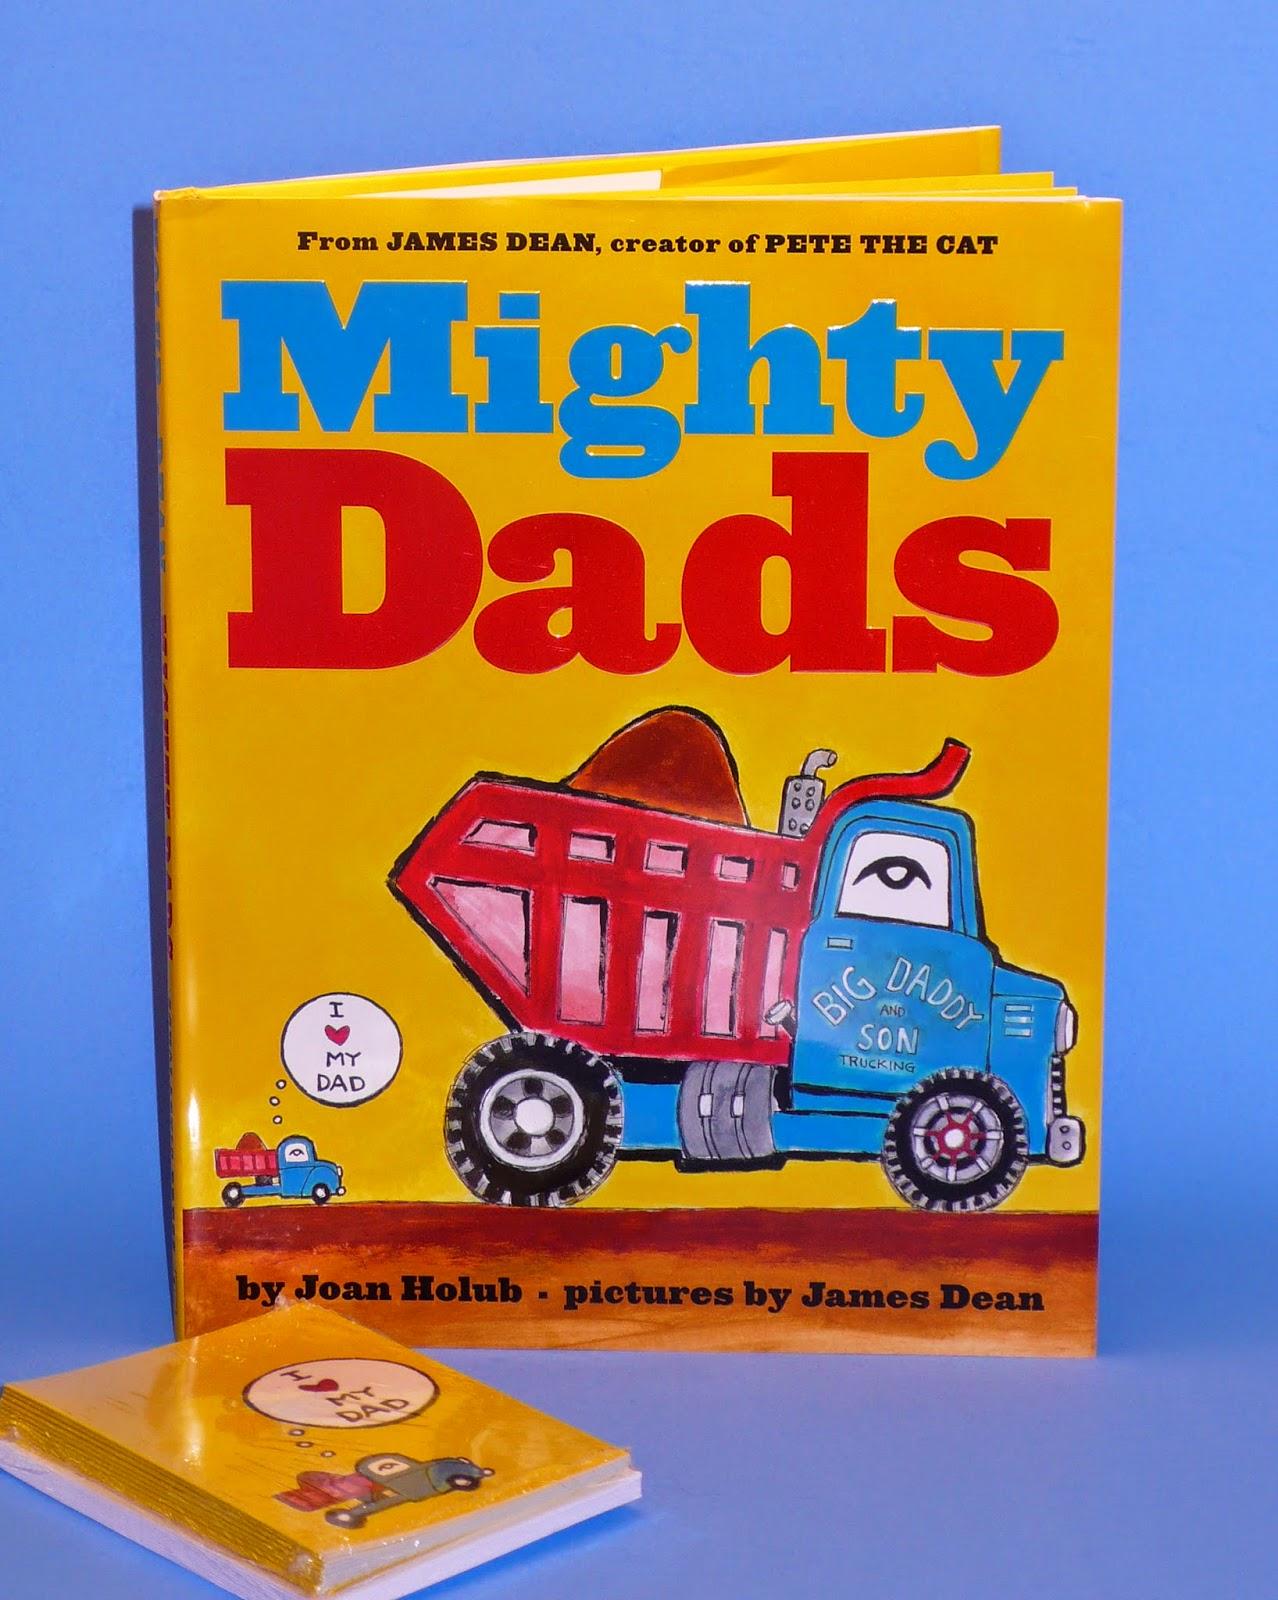 http://www.amazon.com/Mighty-Dads-Joan-Holub/dp/0545609682/ref=sr_1_1_title_0_main?s=books&ie=UTF8&qid=1389317753&sr=1-1&keywords=mighty+dads